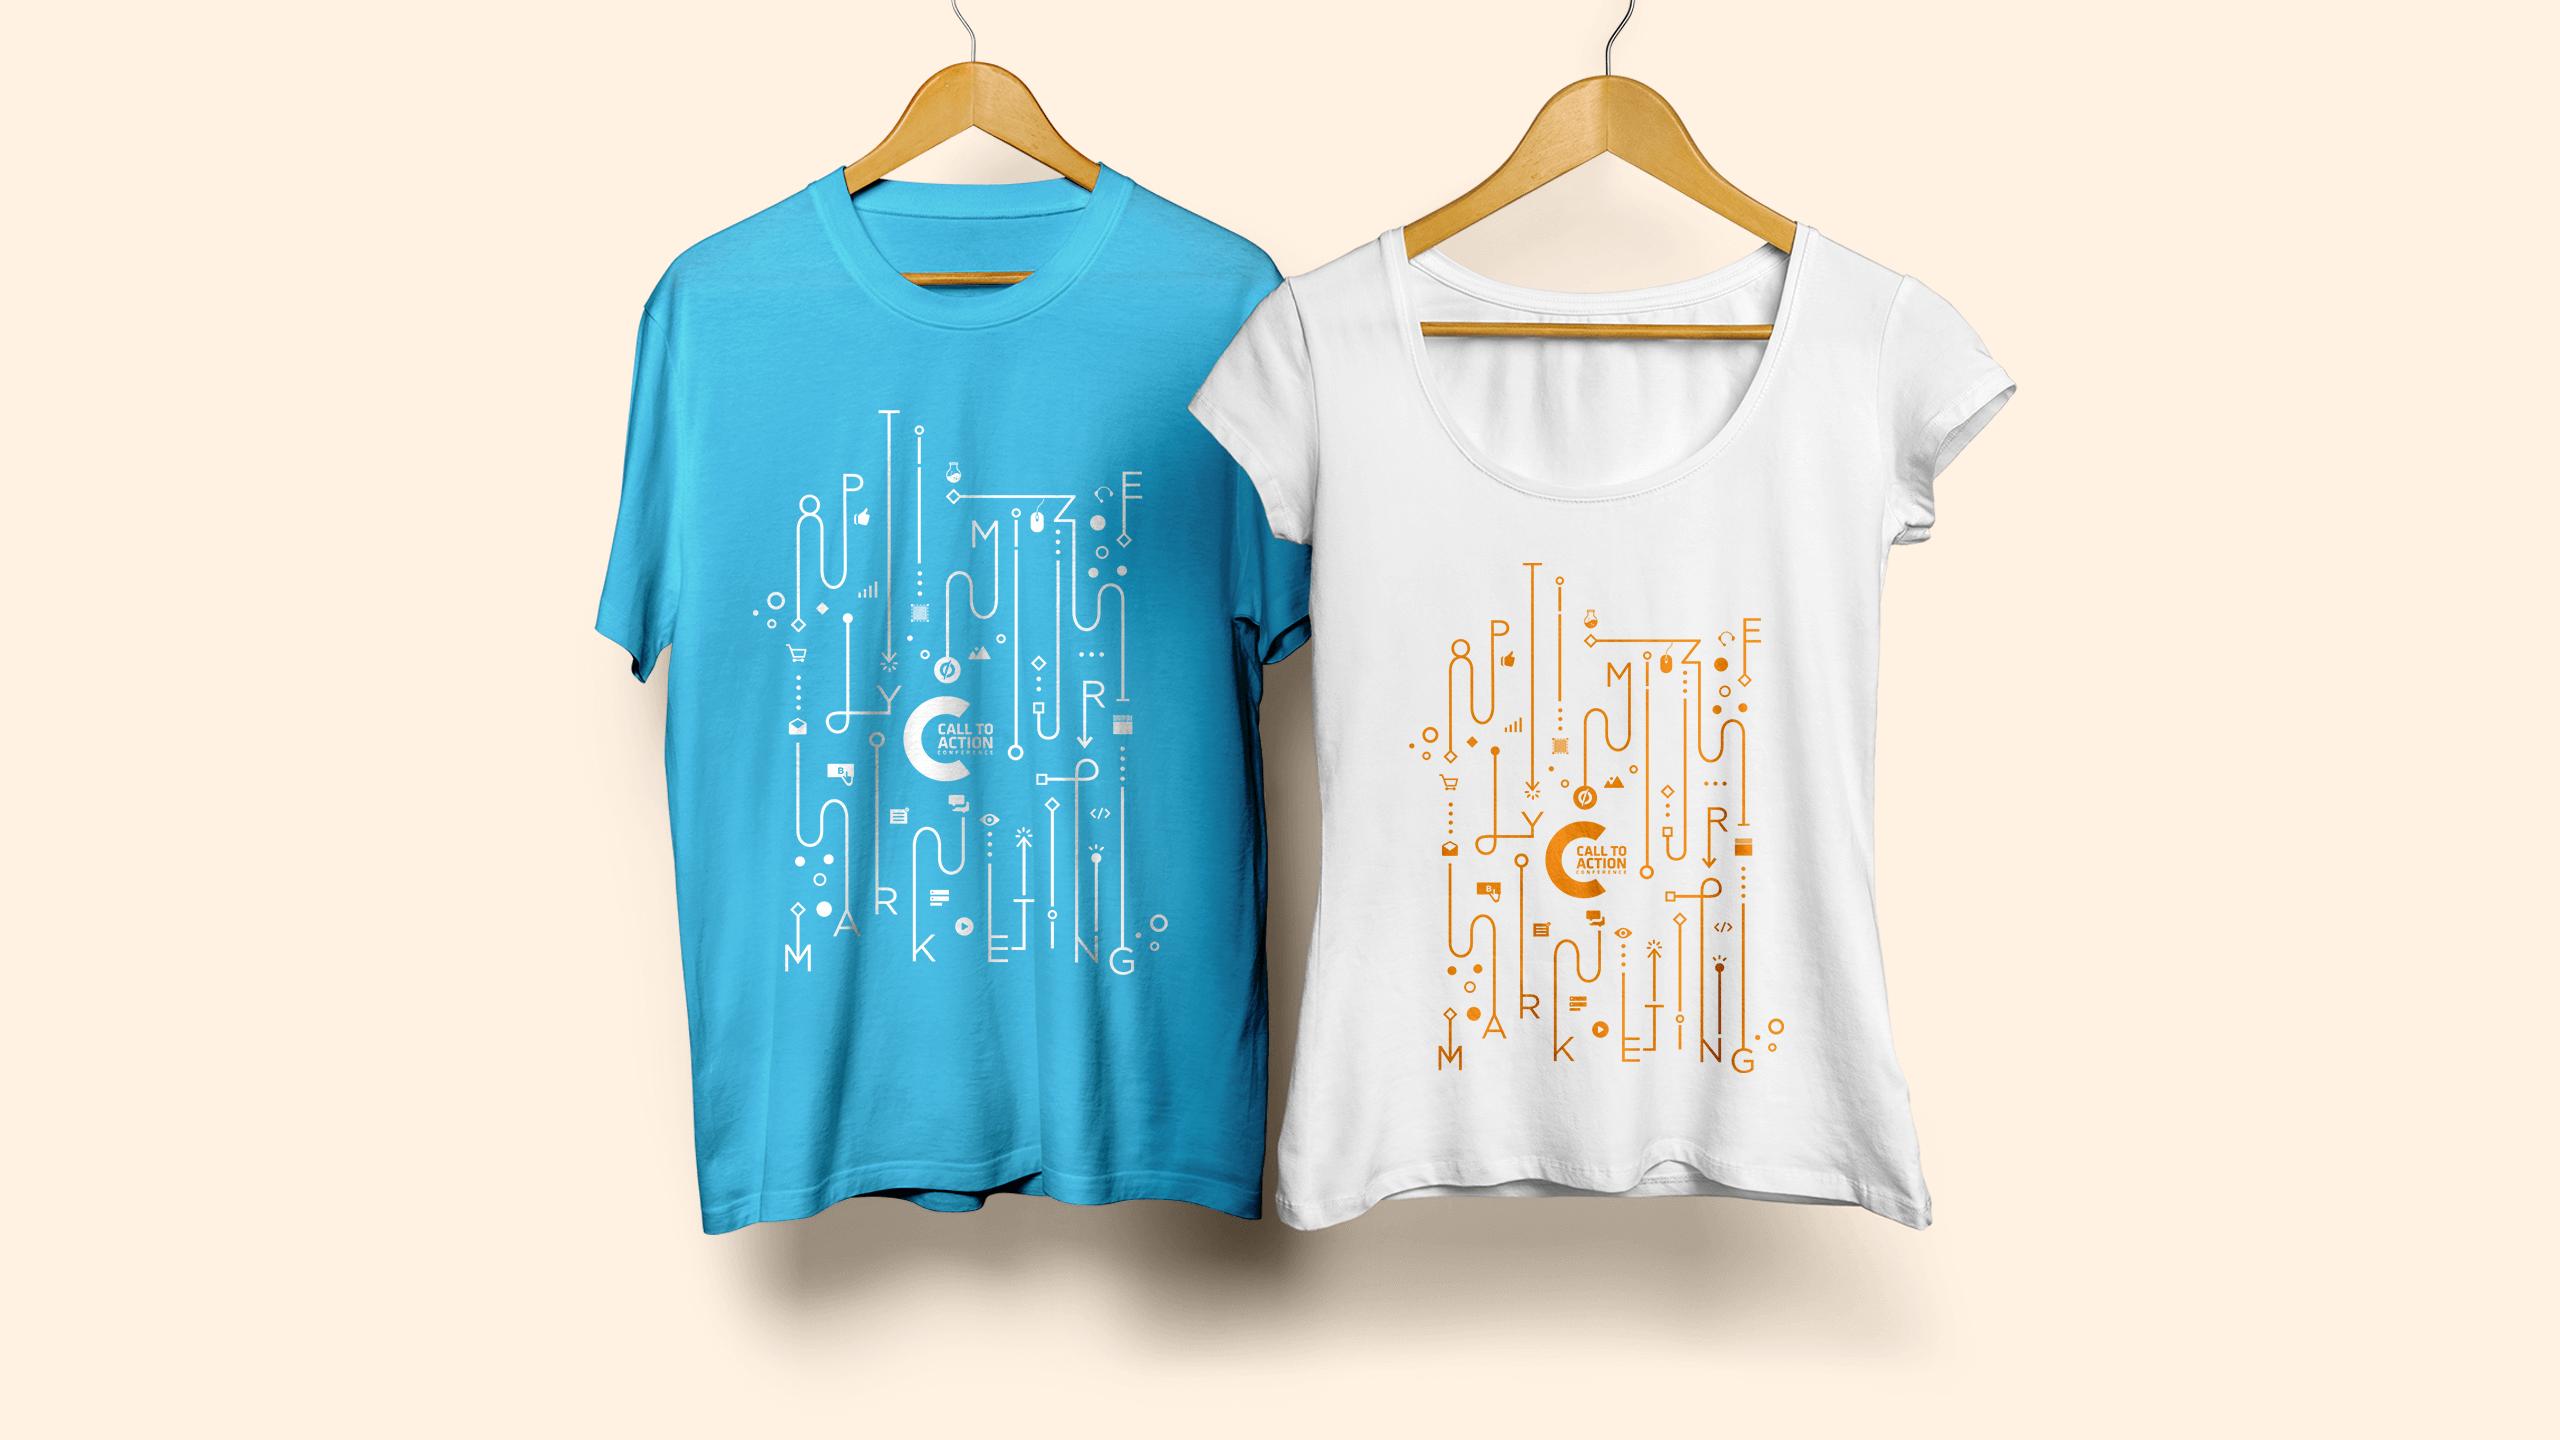 cta-conf-male&female-shirts